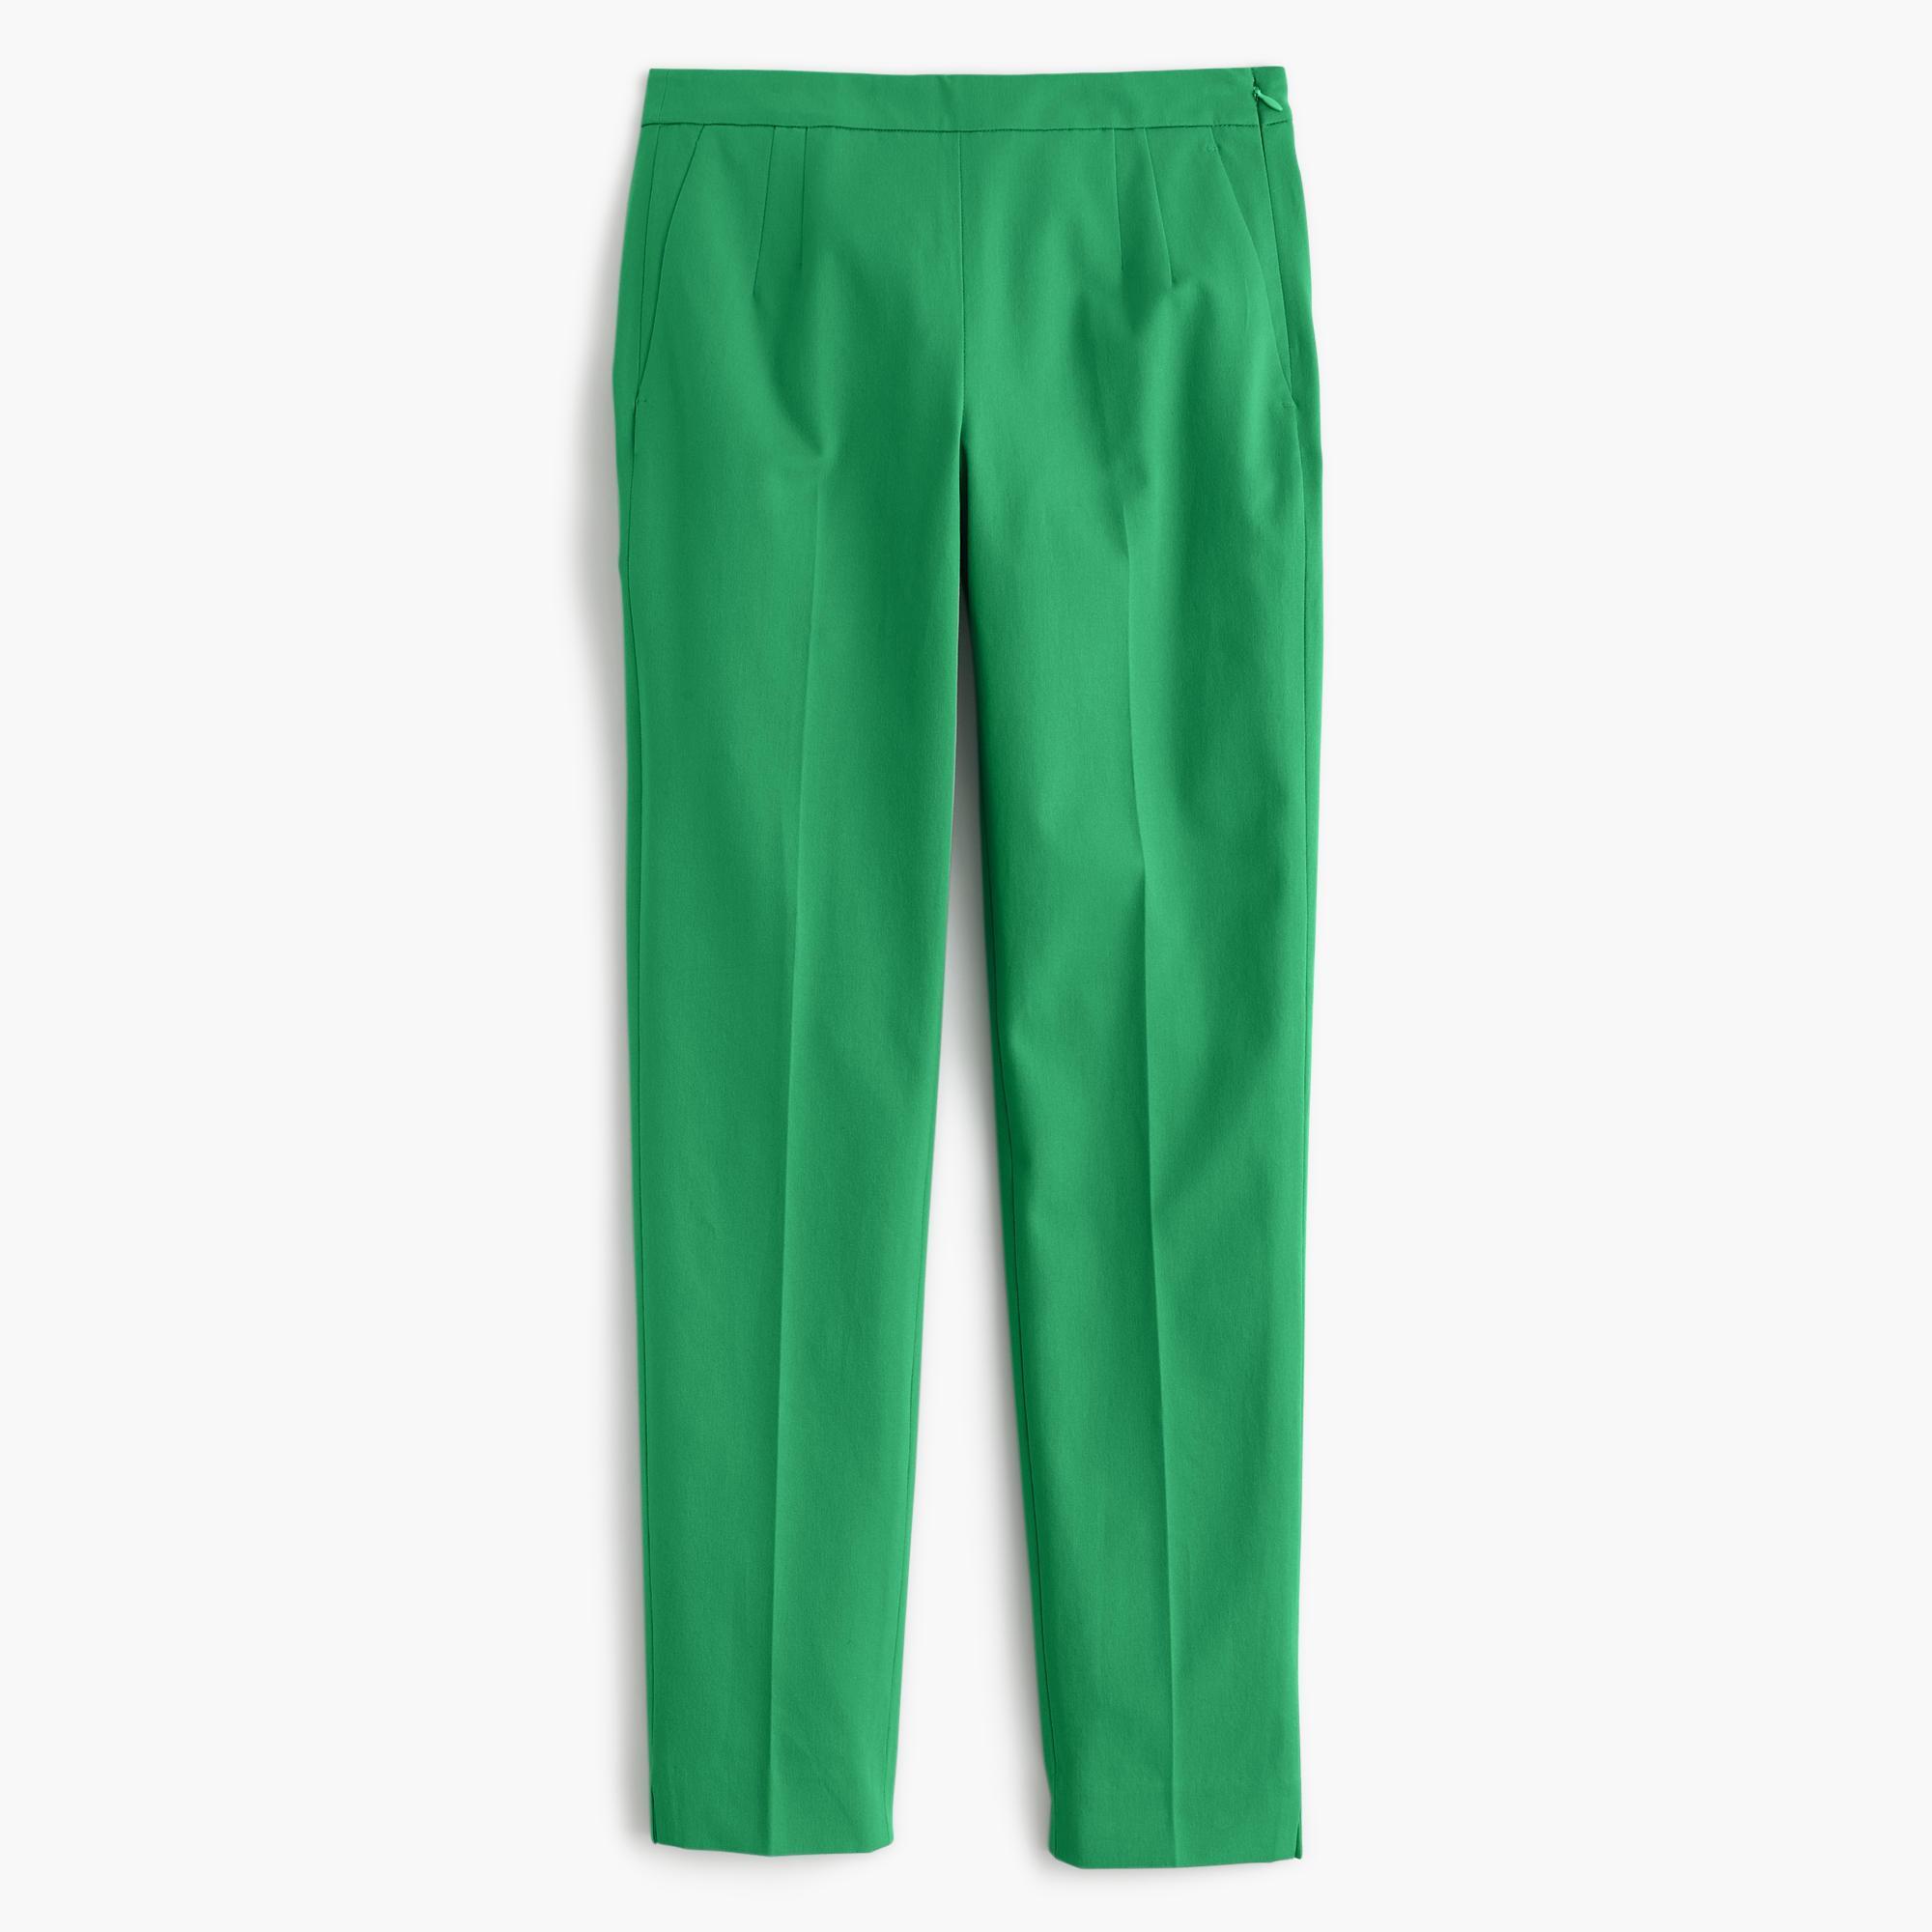 NEW WOMEN J CREW MARTIE SLIM CROP PANTS TWO WAY STRETCH COTTON WARM CLOVER GREEN